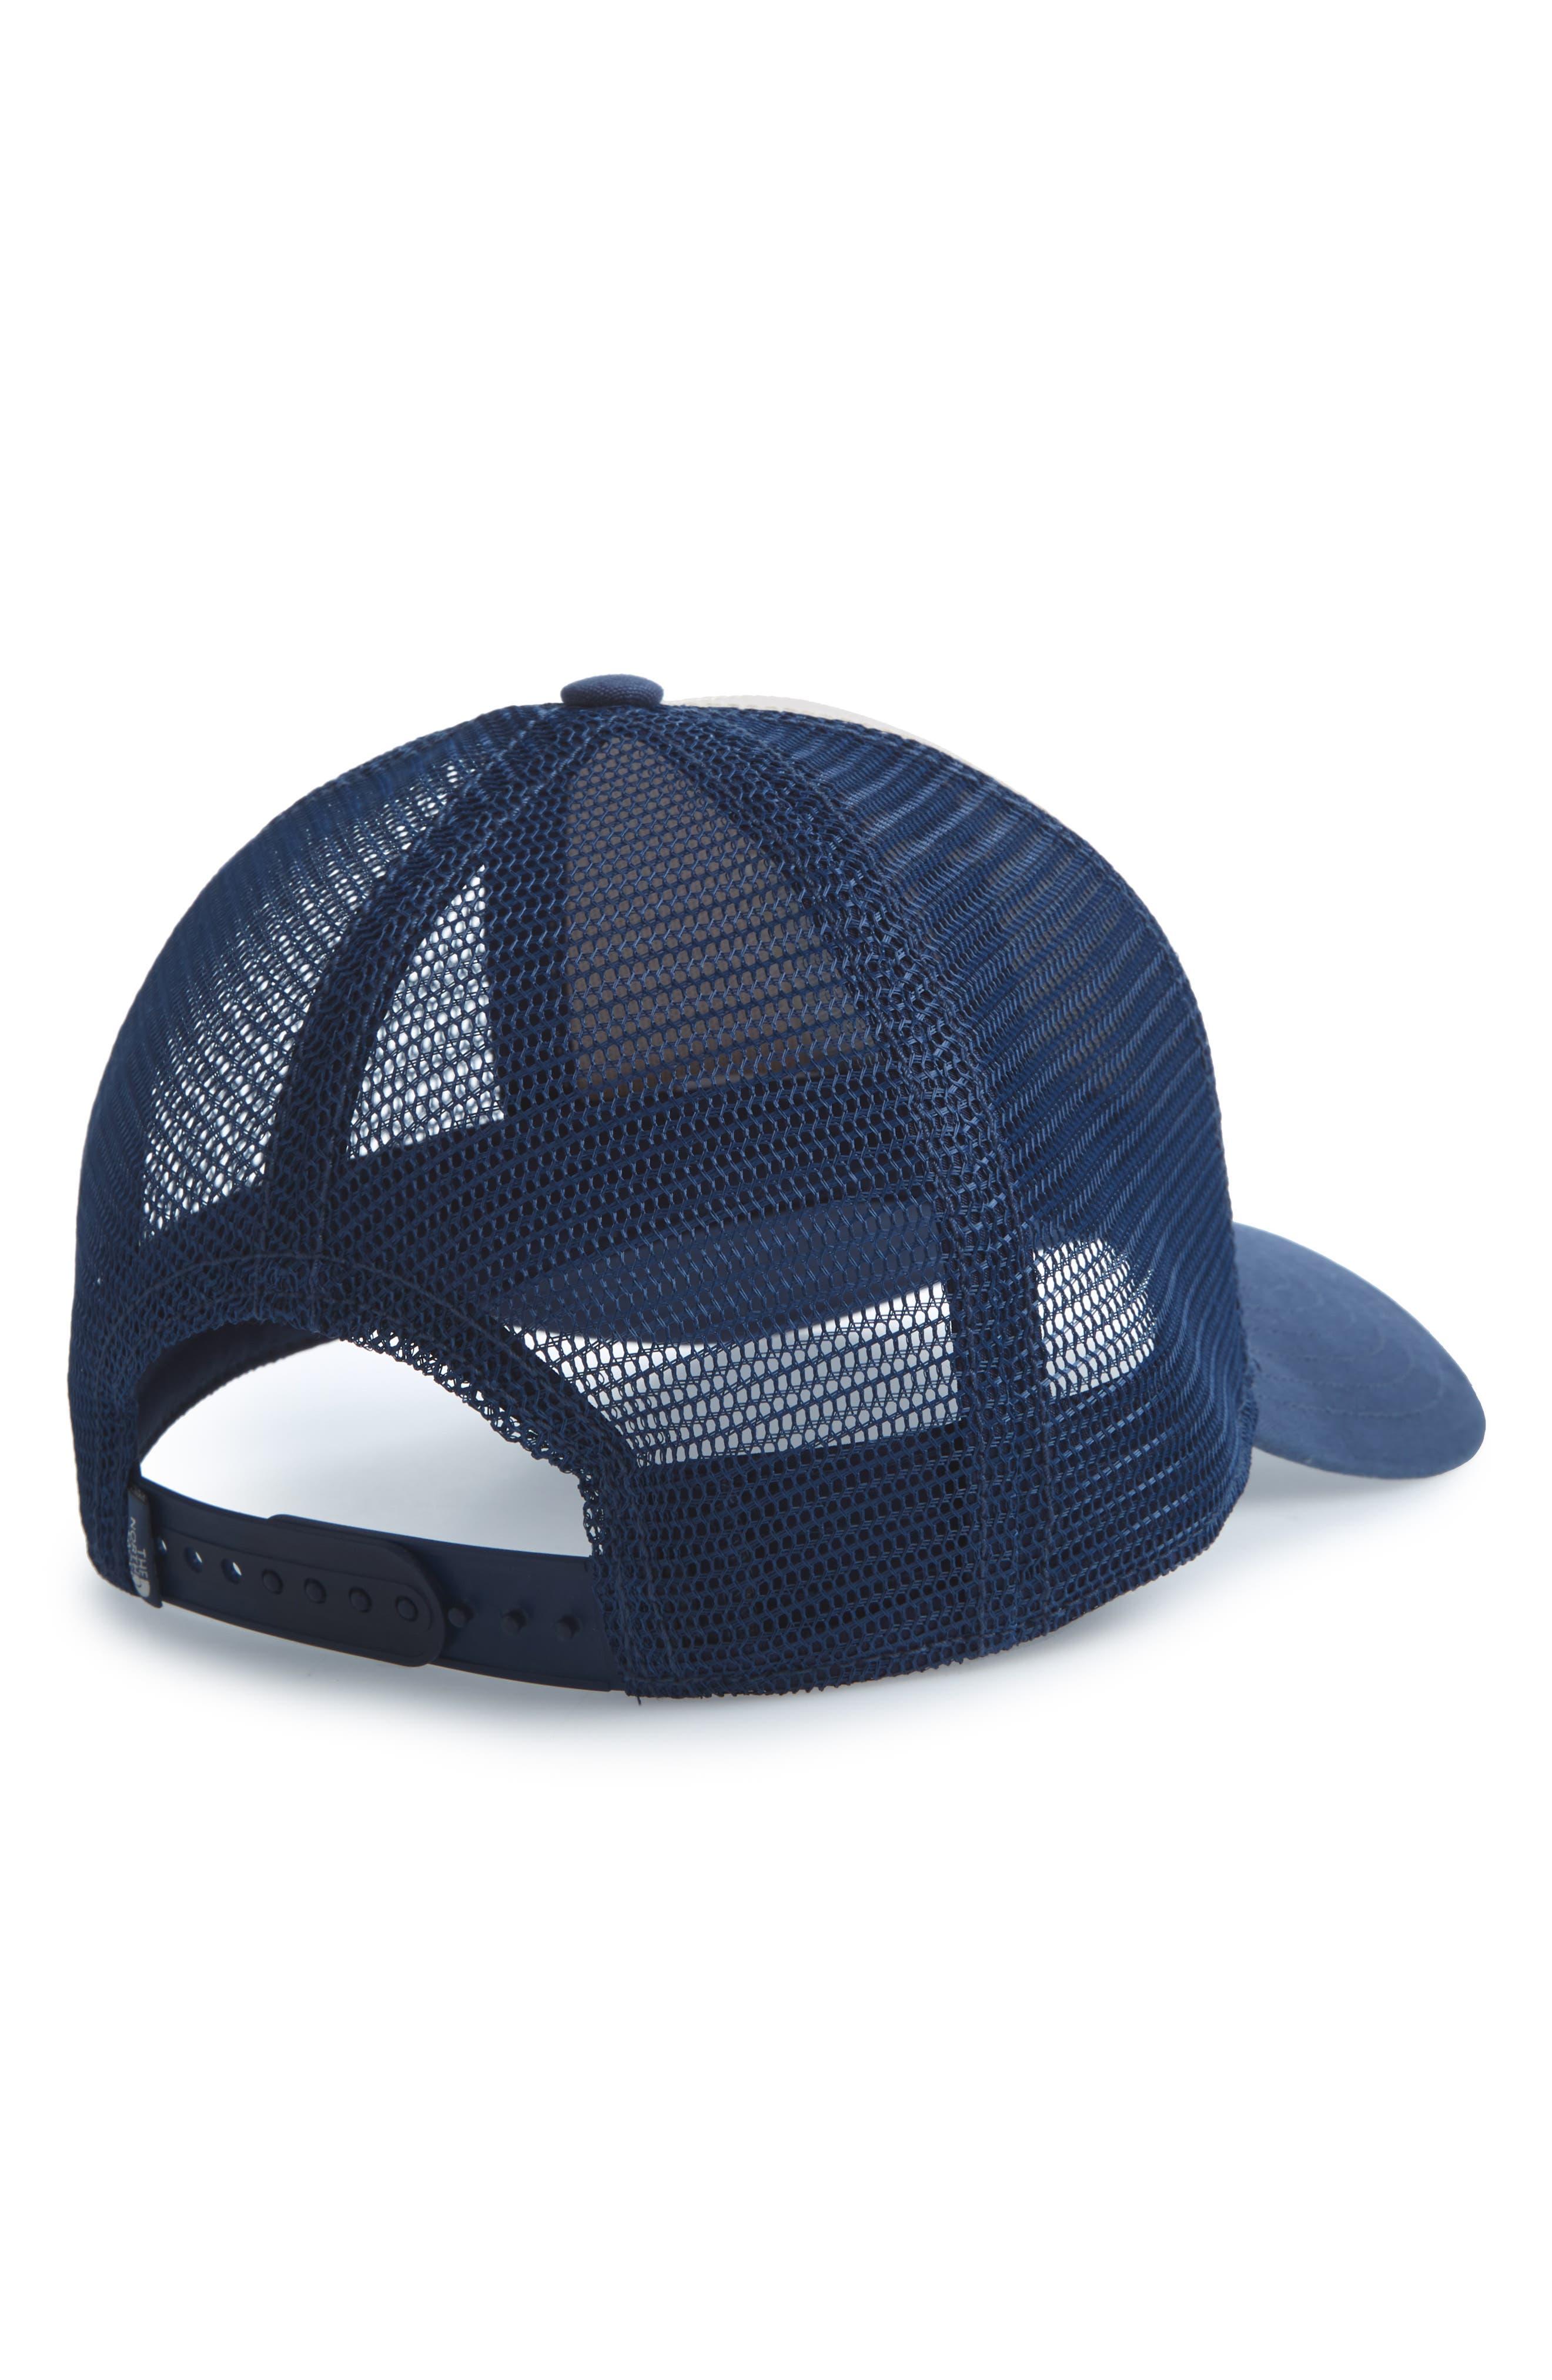 Mudder Trucker Hat,                             Alternate thumbnail 2, color,                             BEIGE/ BLUE/ GREEN